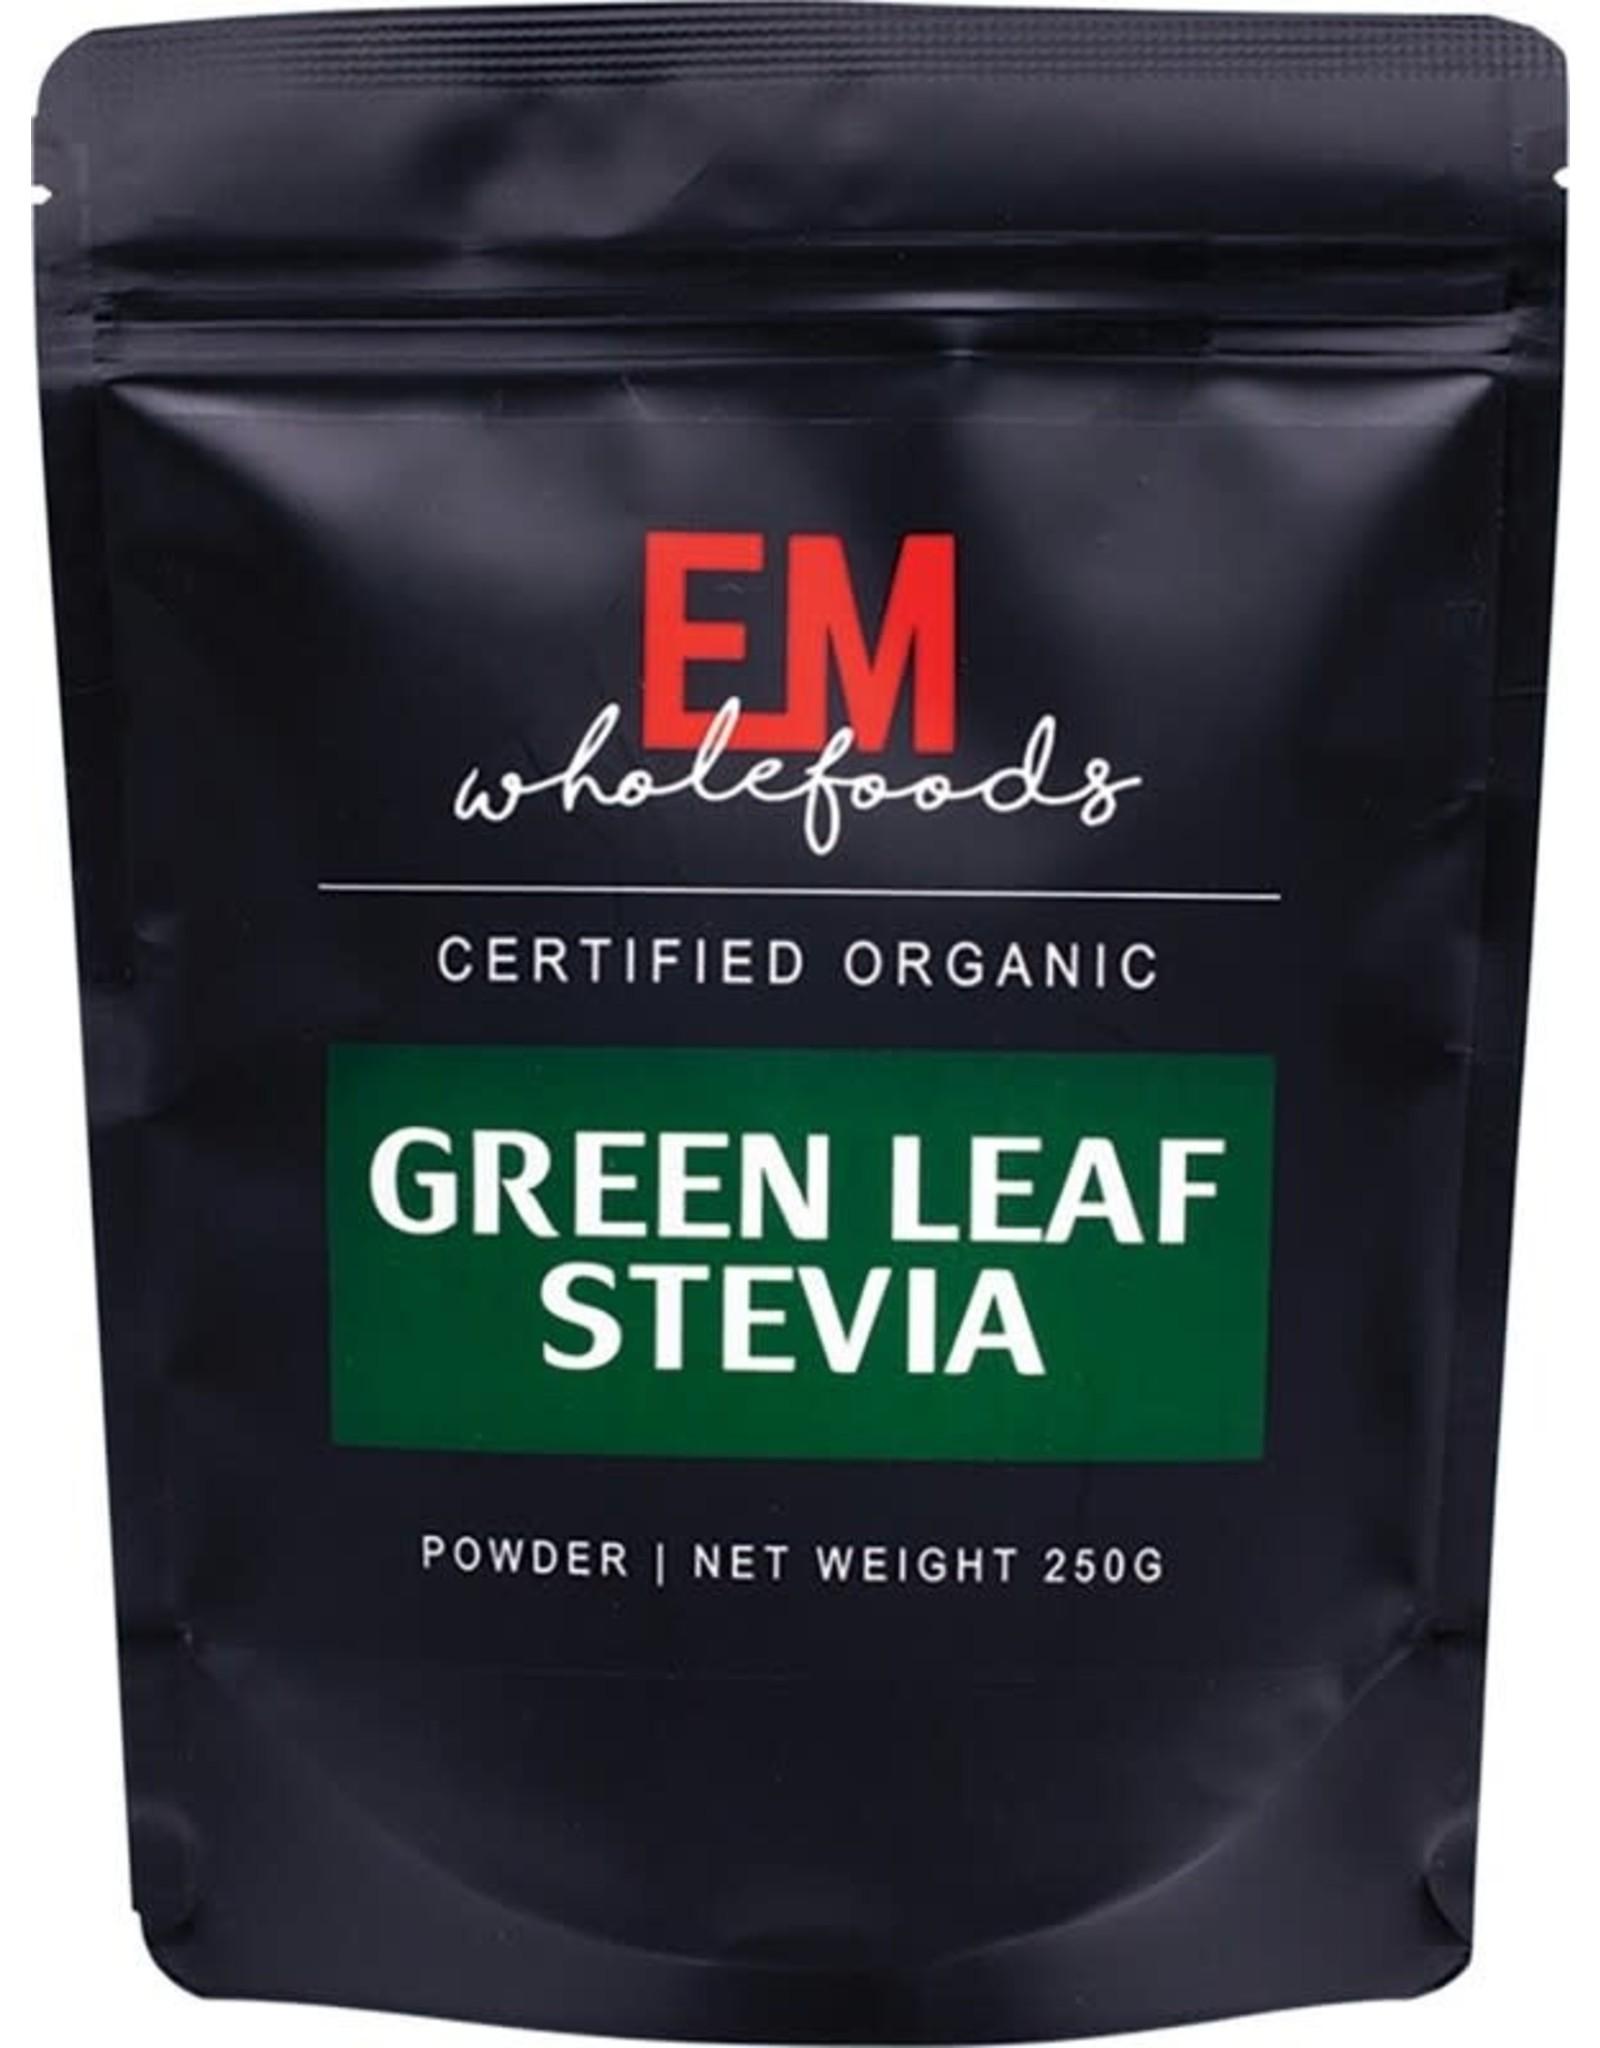 EM Superfoods Green Stevia Leaf Powder 100% Pure 250g